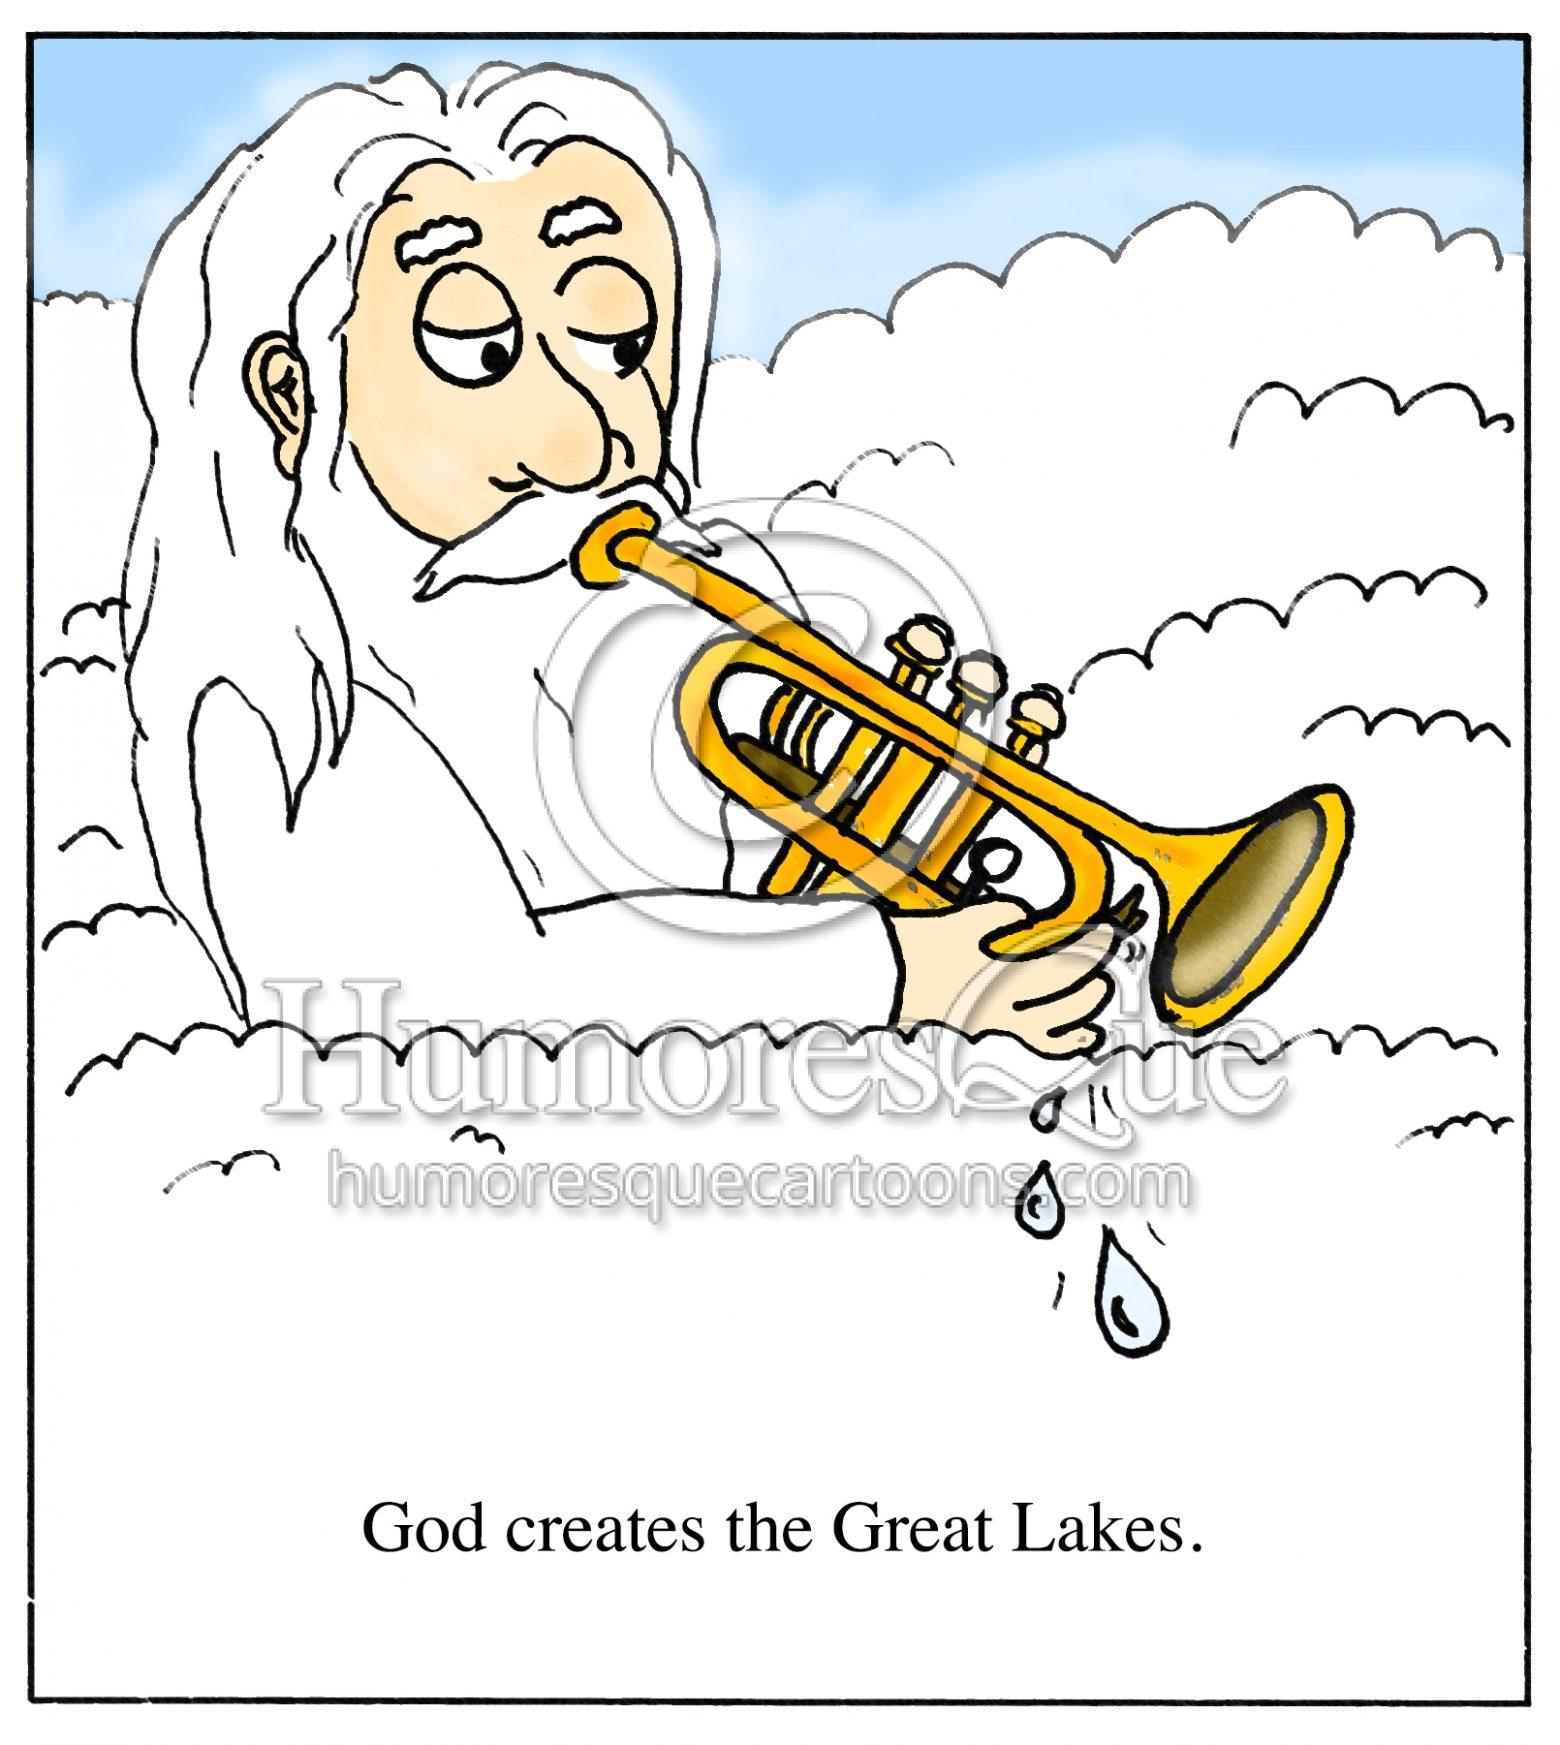 God creates great lakes trumpet spit valve cartoon